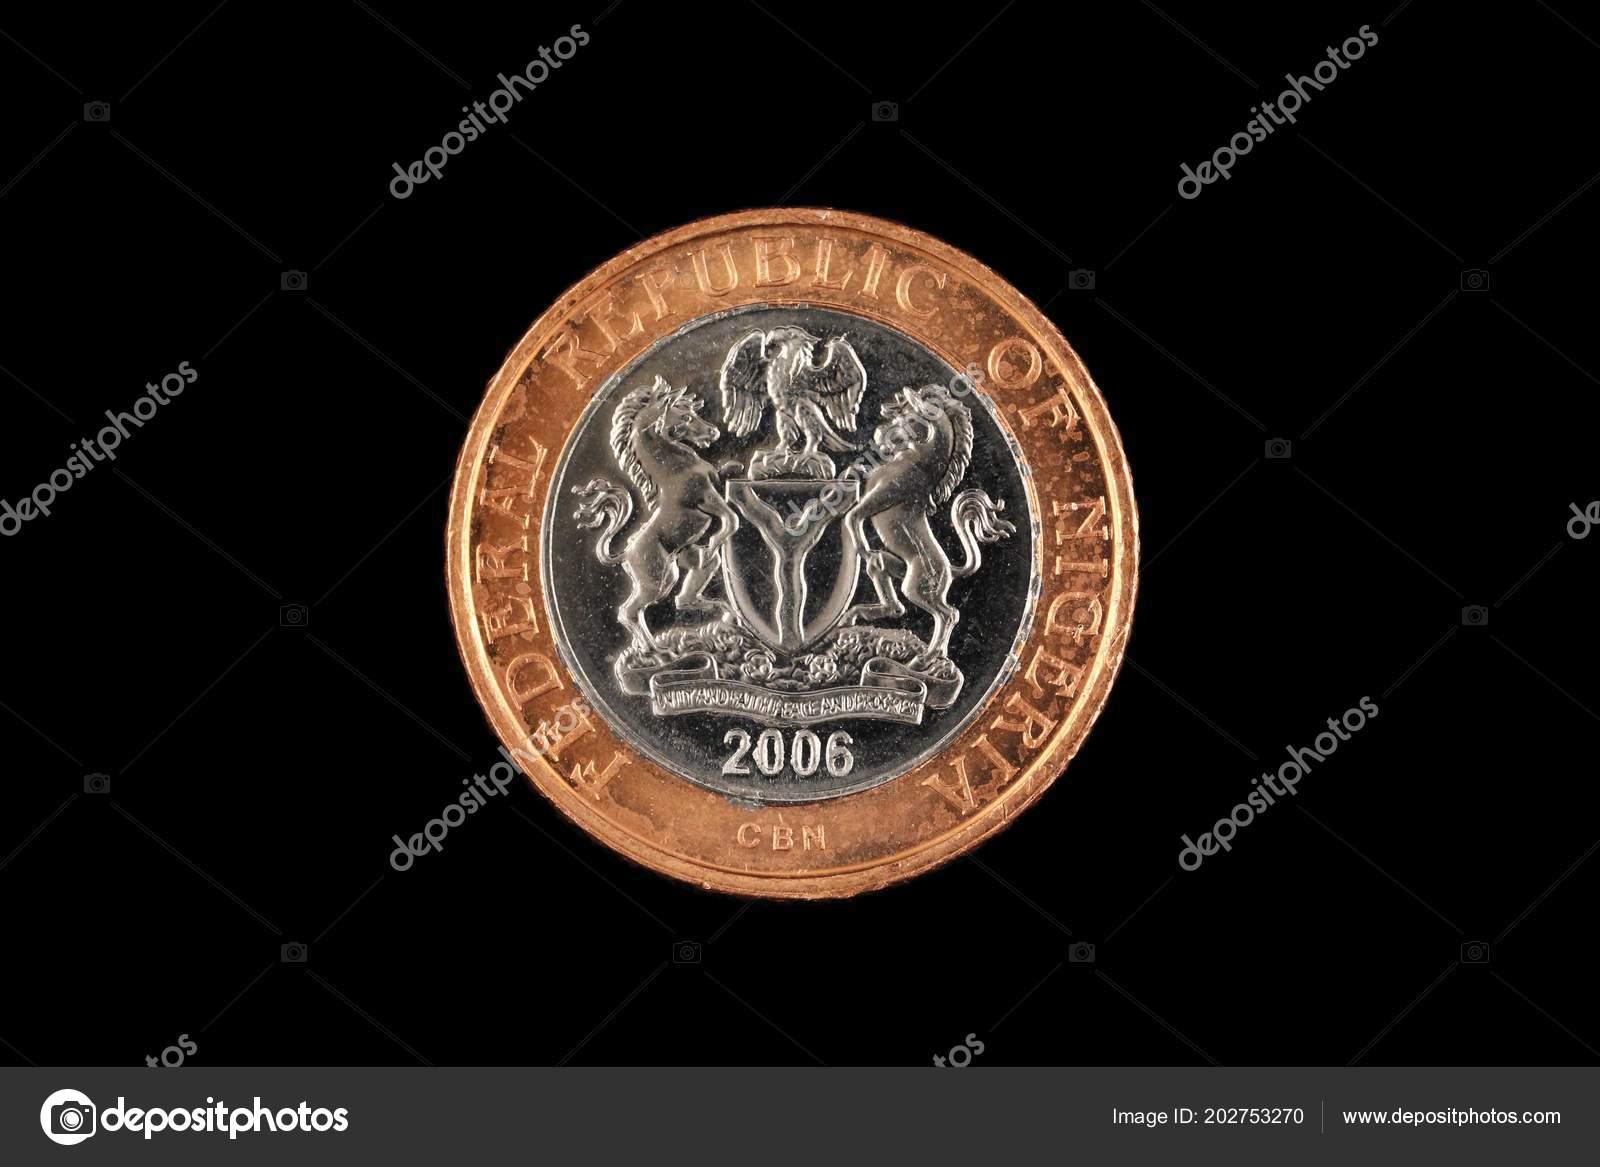 Close Image Nigerian Bimettalic Two Naira Coin Isolated Black